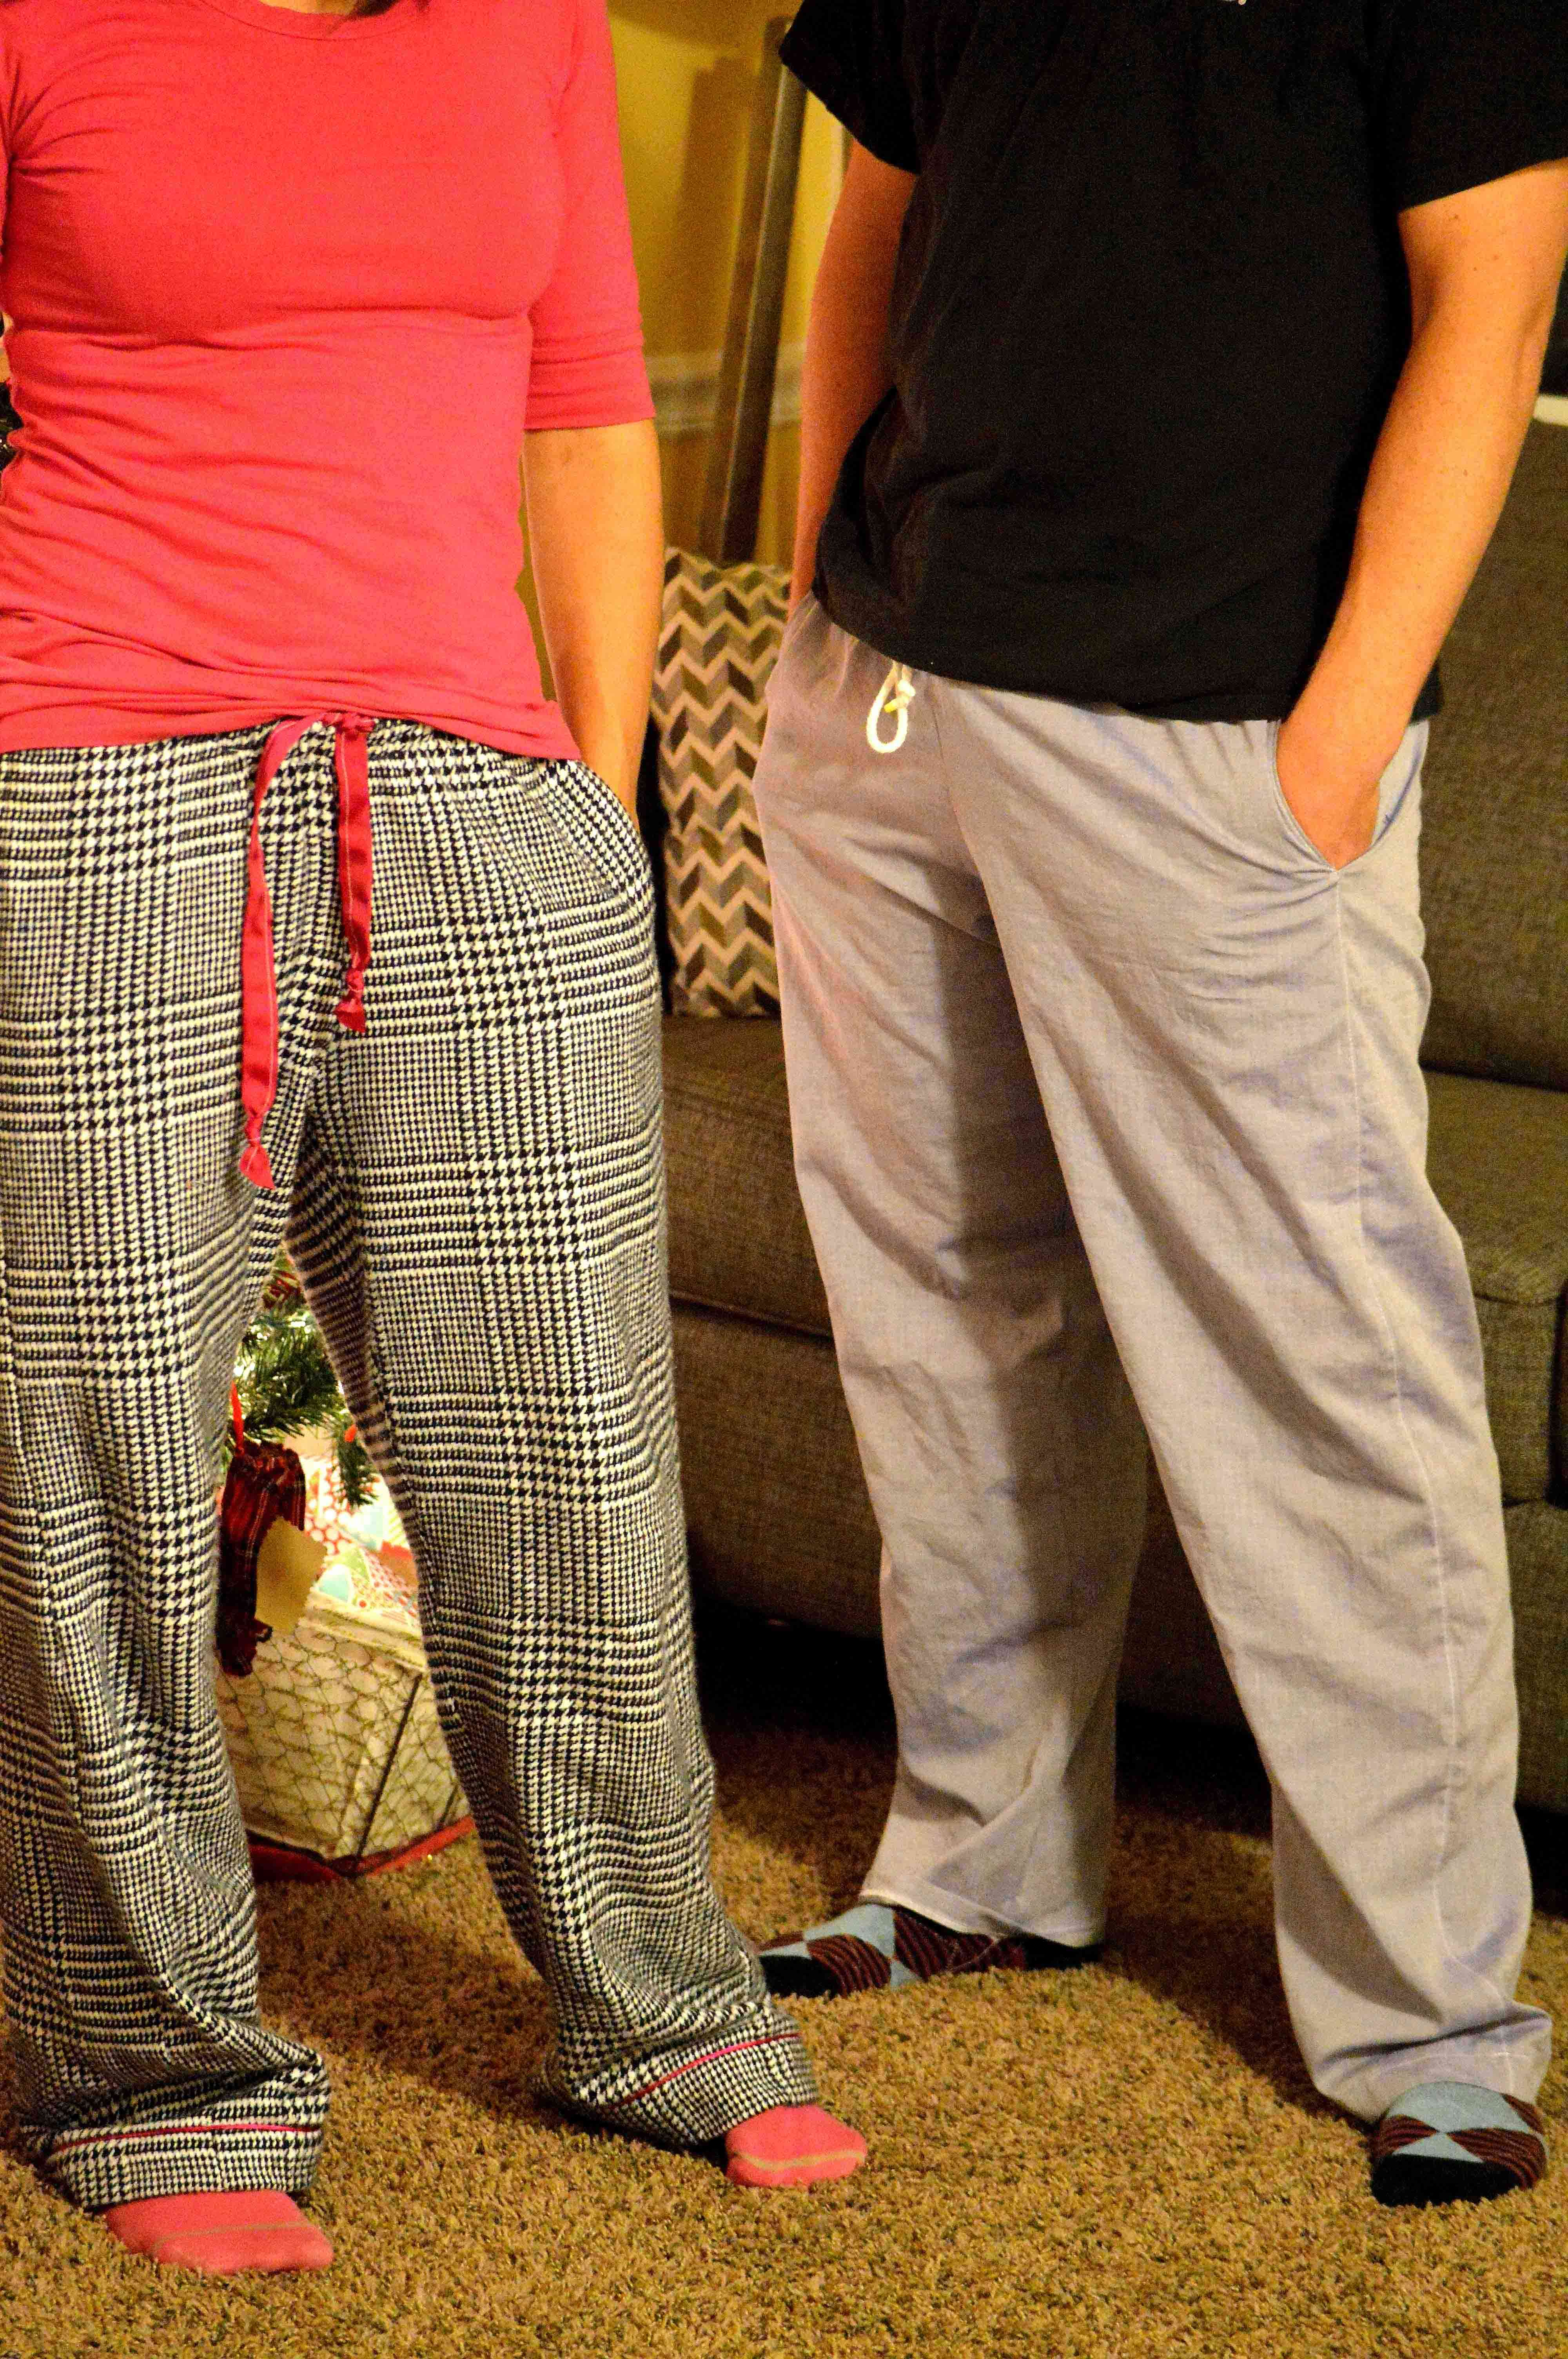 A man and woman wearing pajama pants